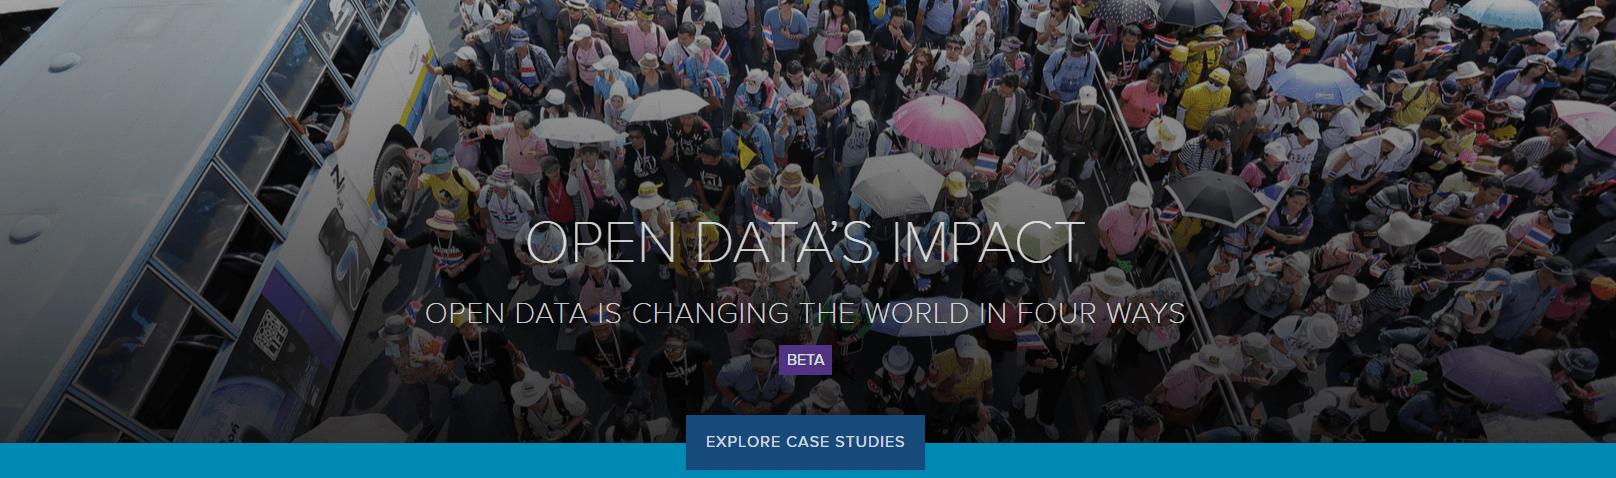 OPEN DATA'S IMPACT